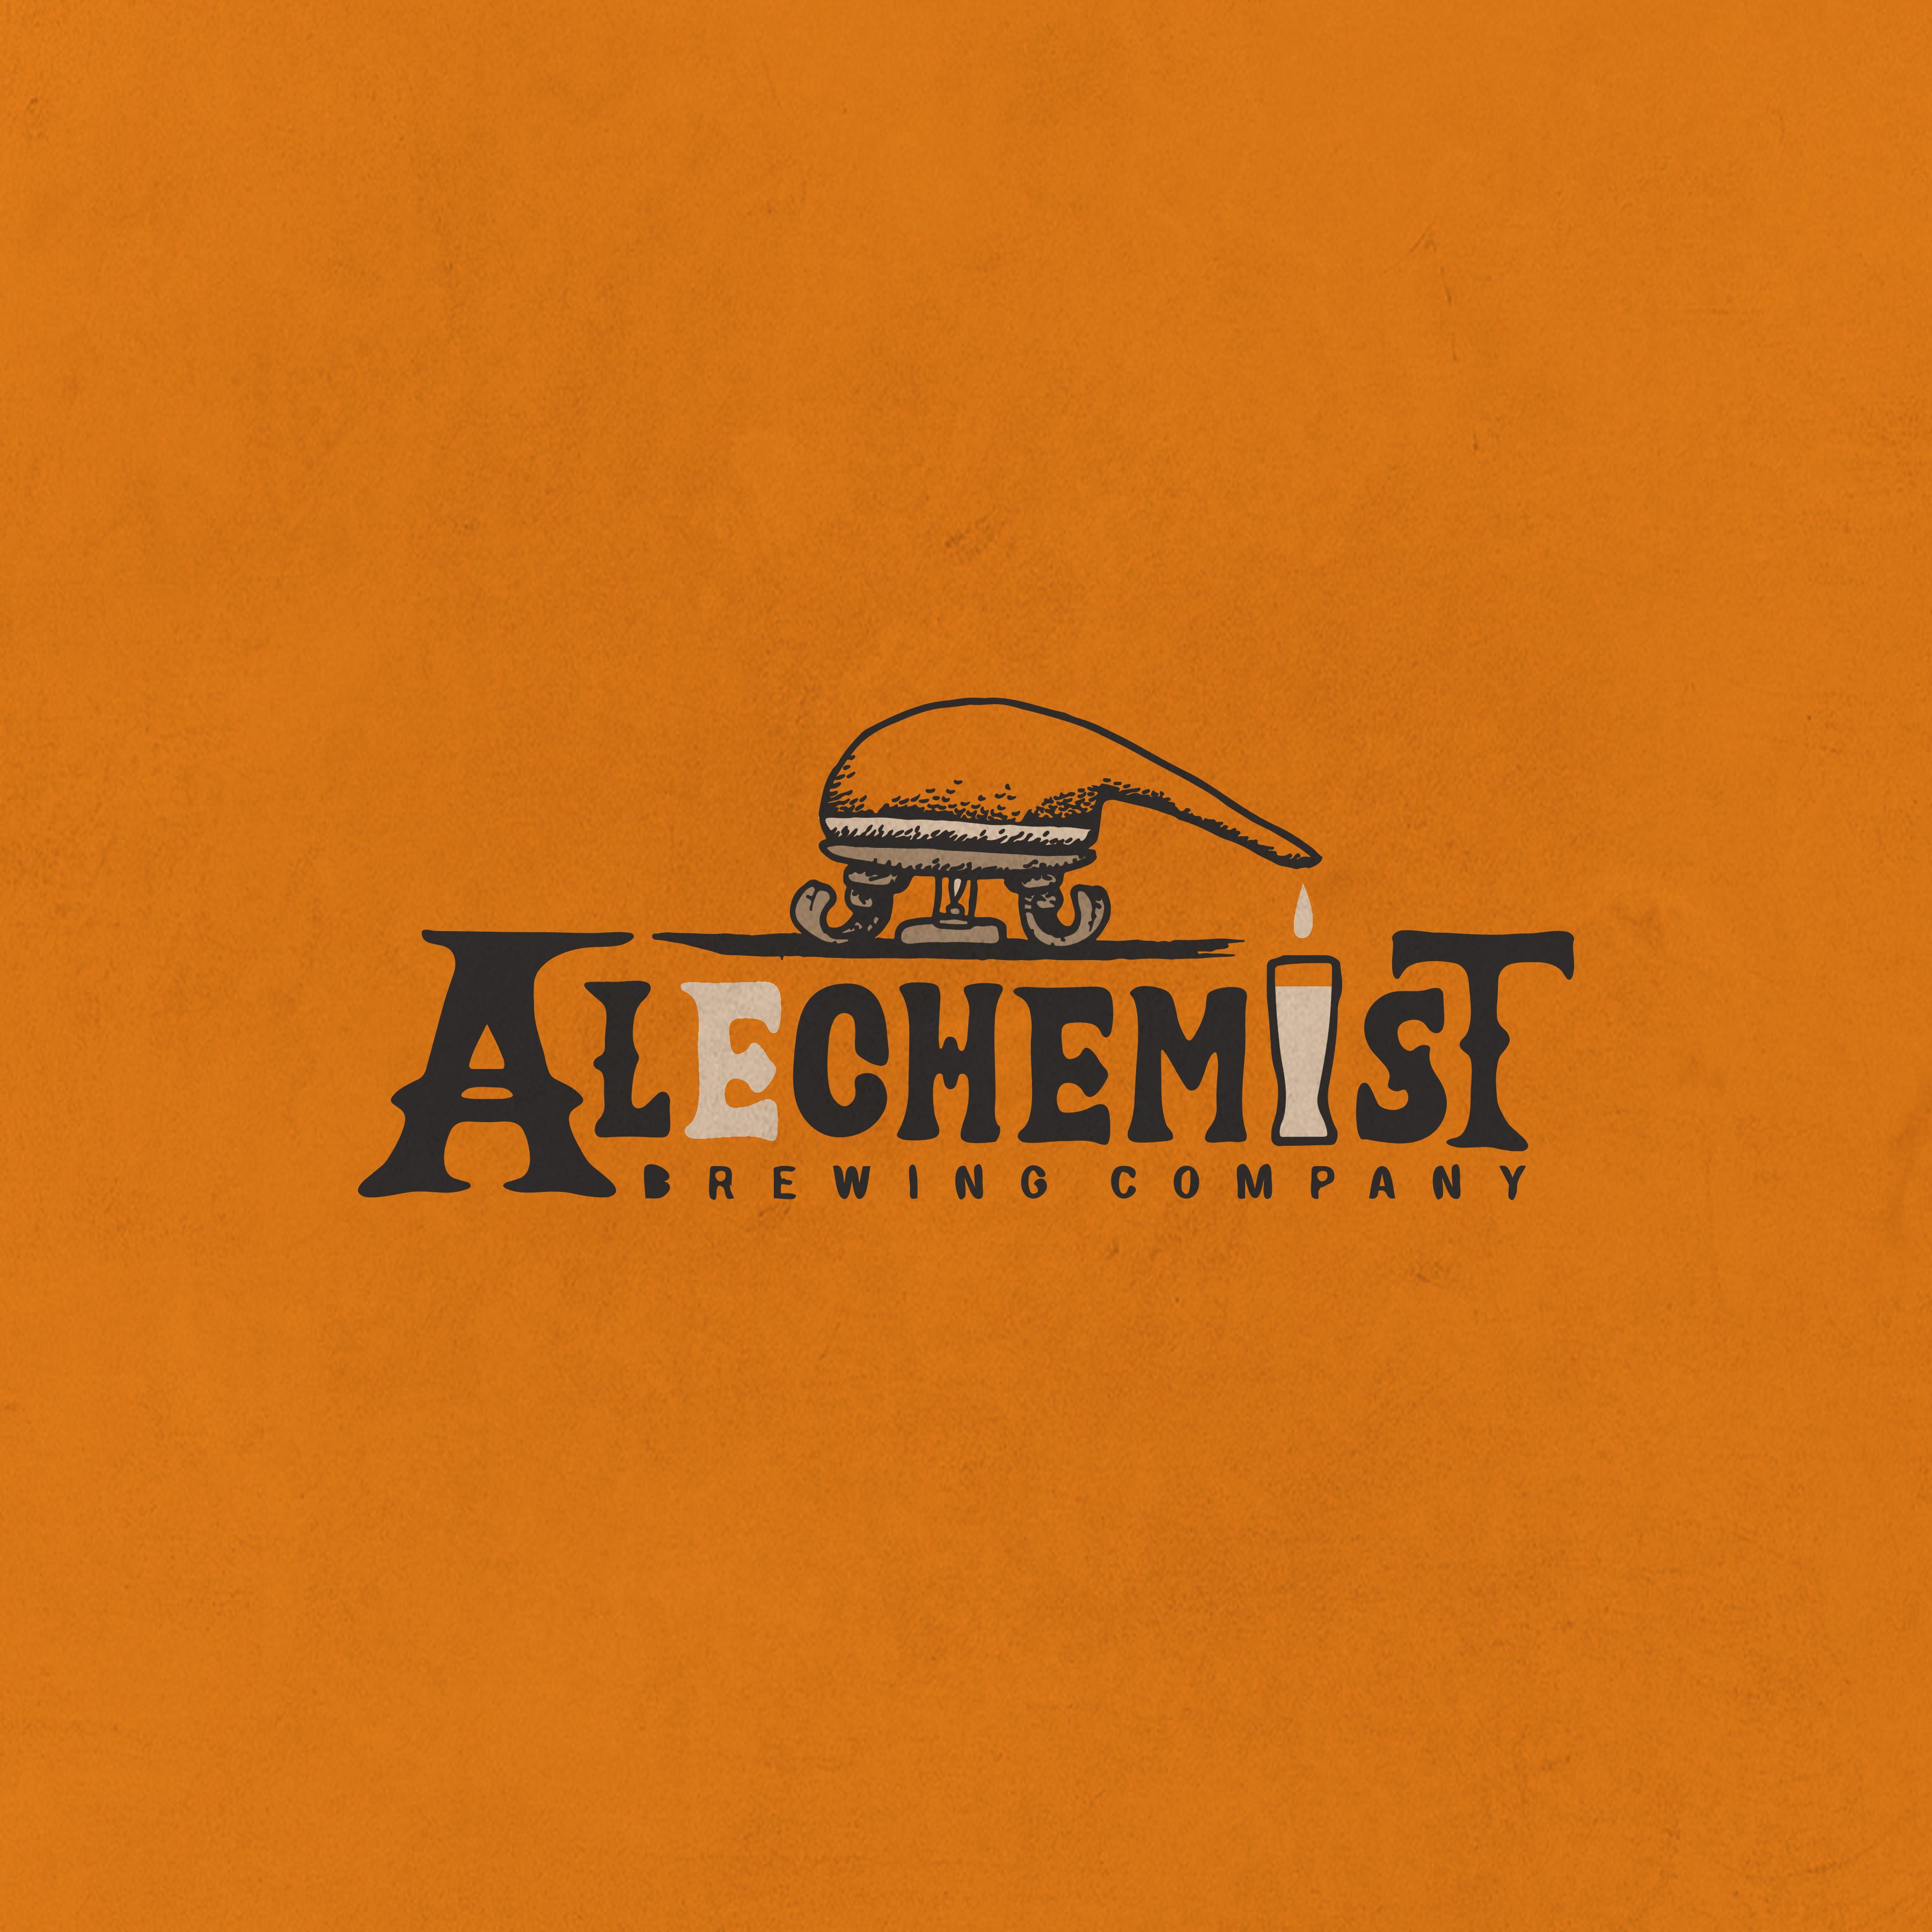 ANerdsWorld_Logos_Alchemist